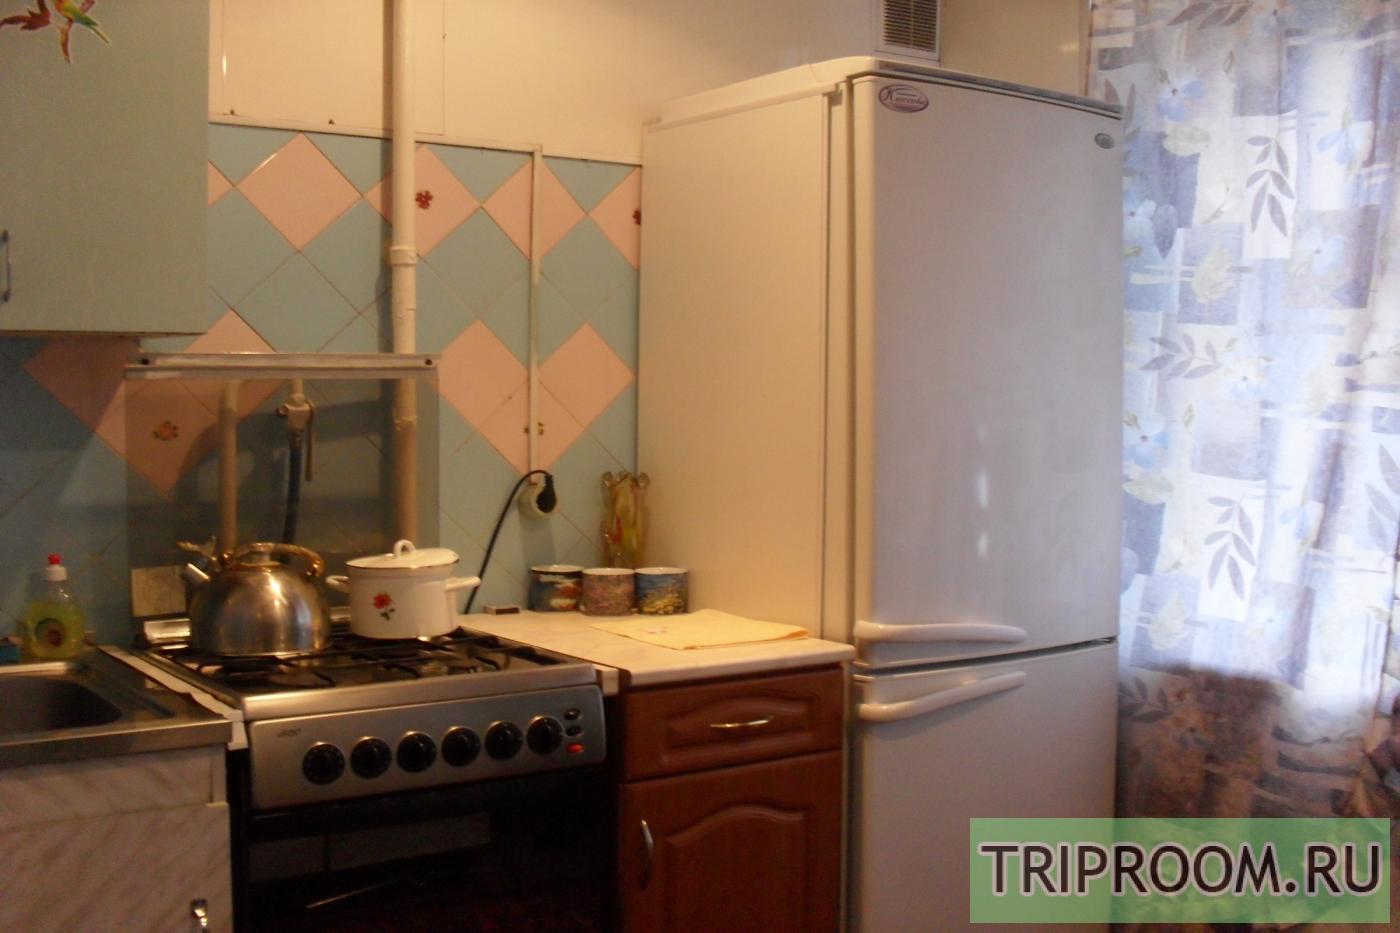 2-комнатная квартира посуточно (вариант № 4940), ул. Еременко улица, фото № 6